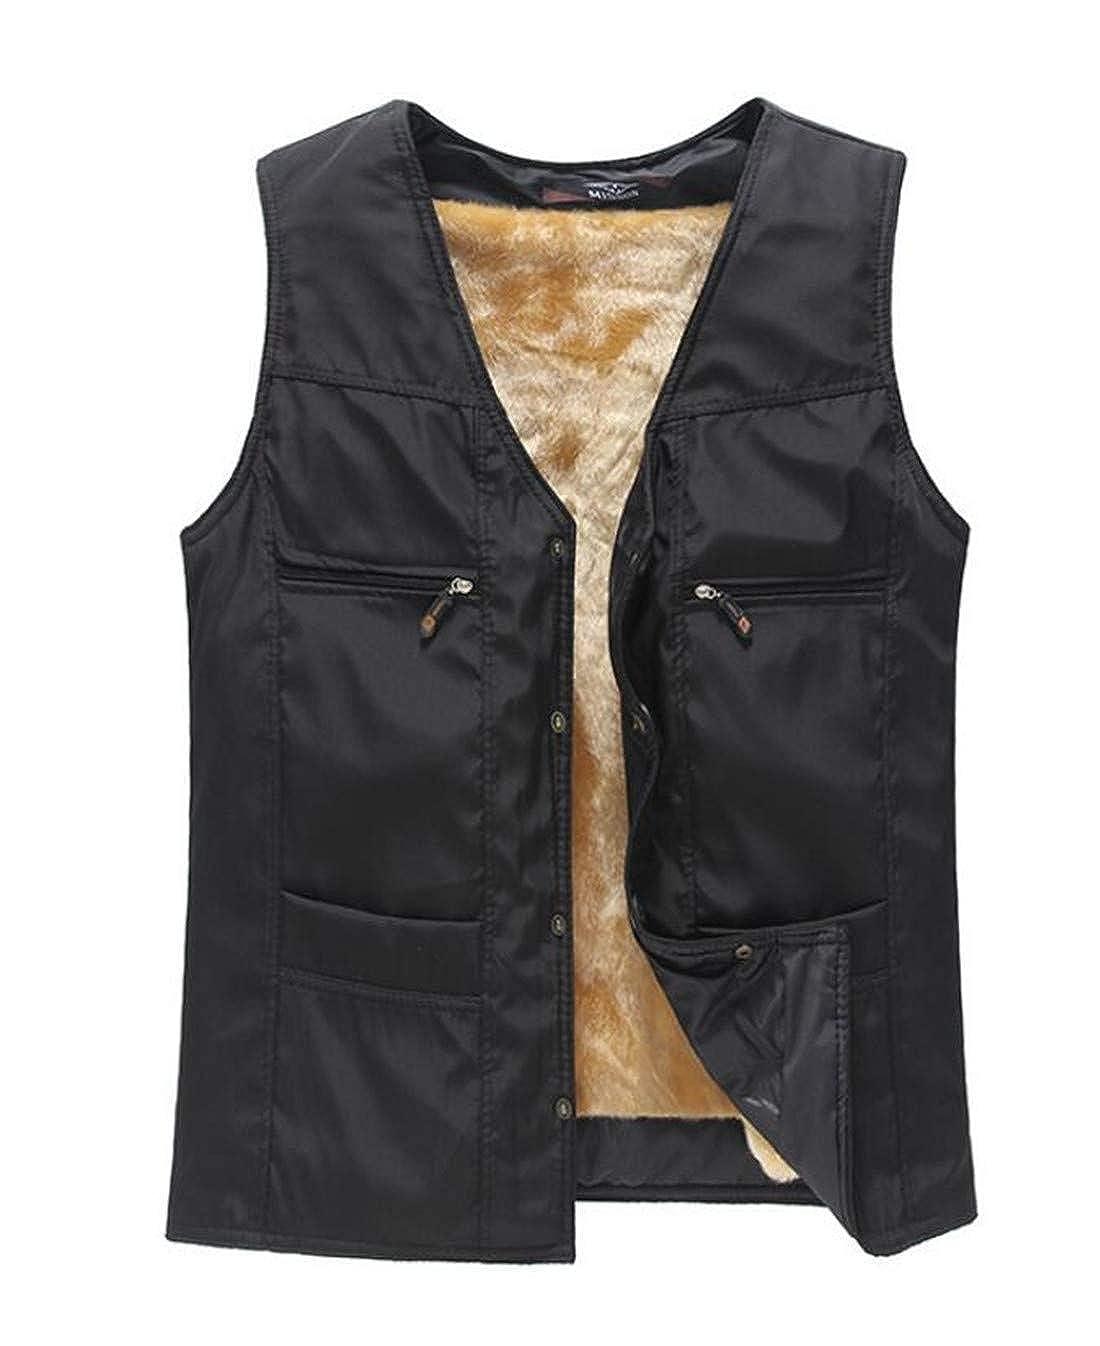 Ueioc Men Sleeveless Jacket V-Neck Quilted Fleece Lined Vest